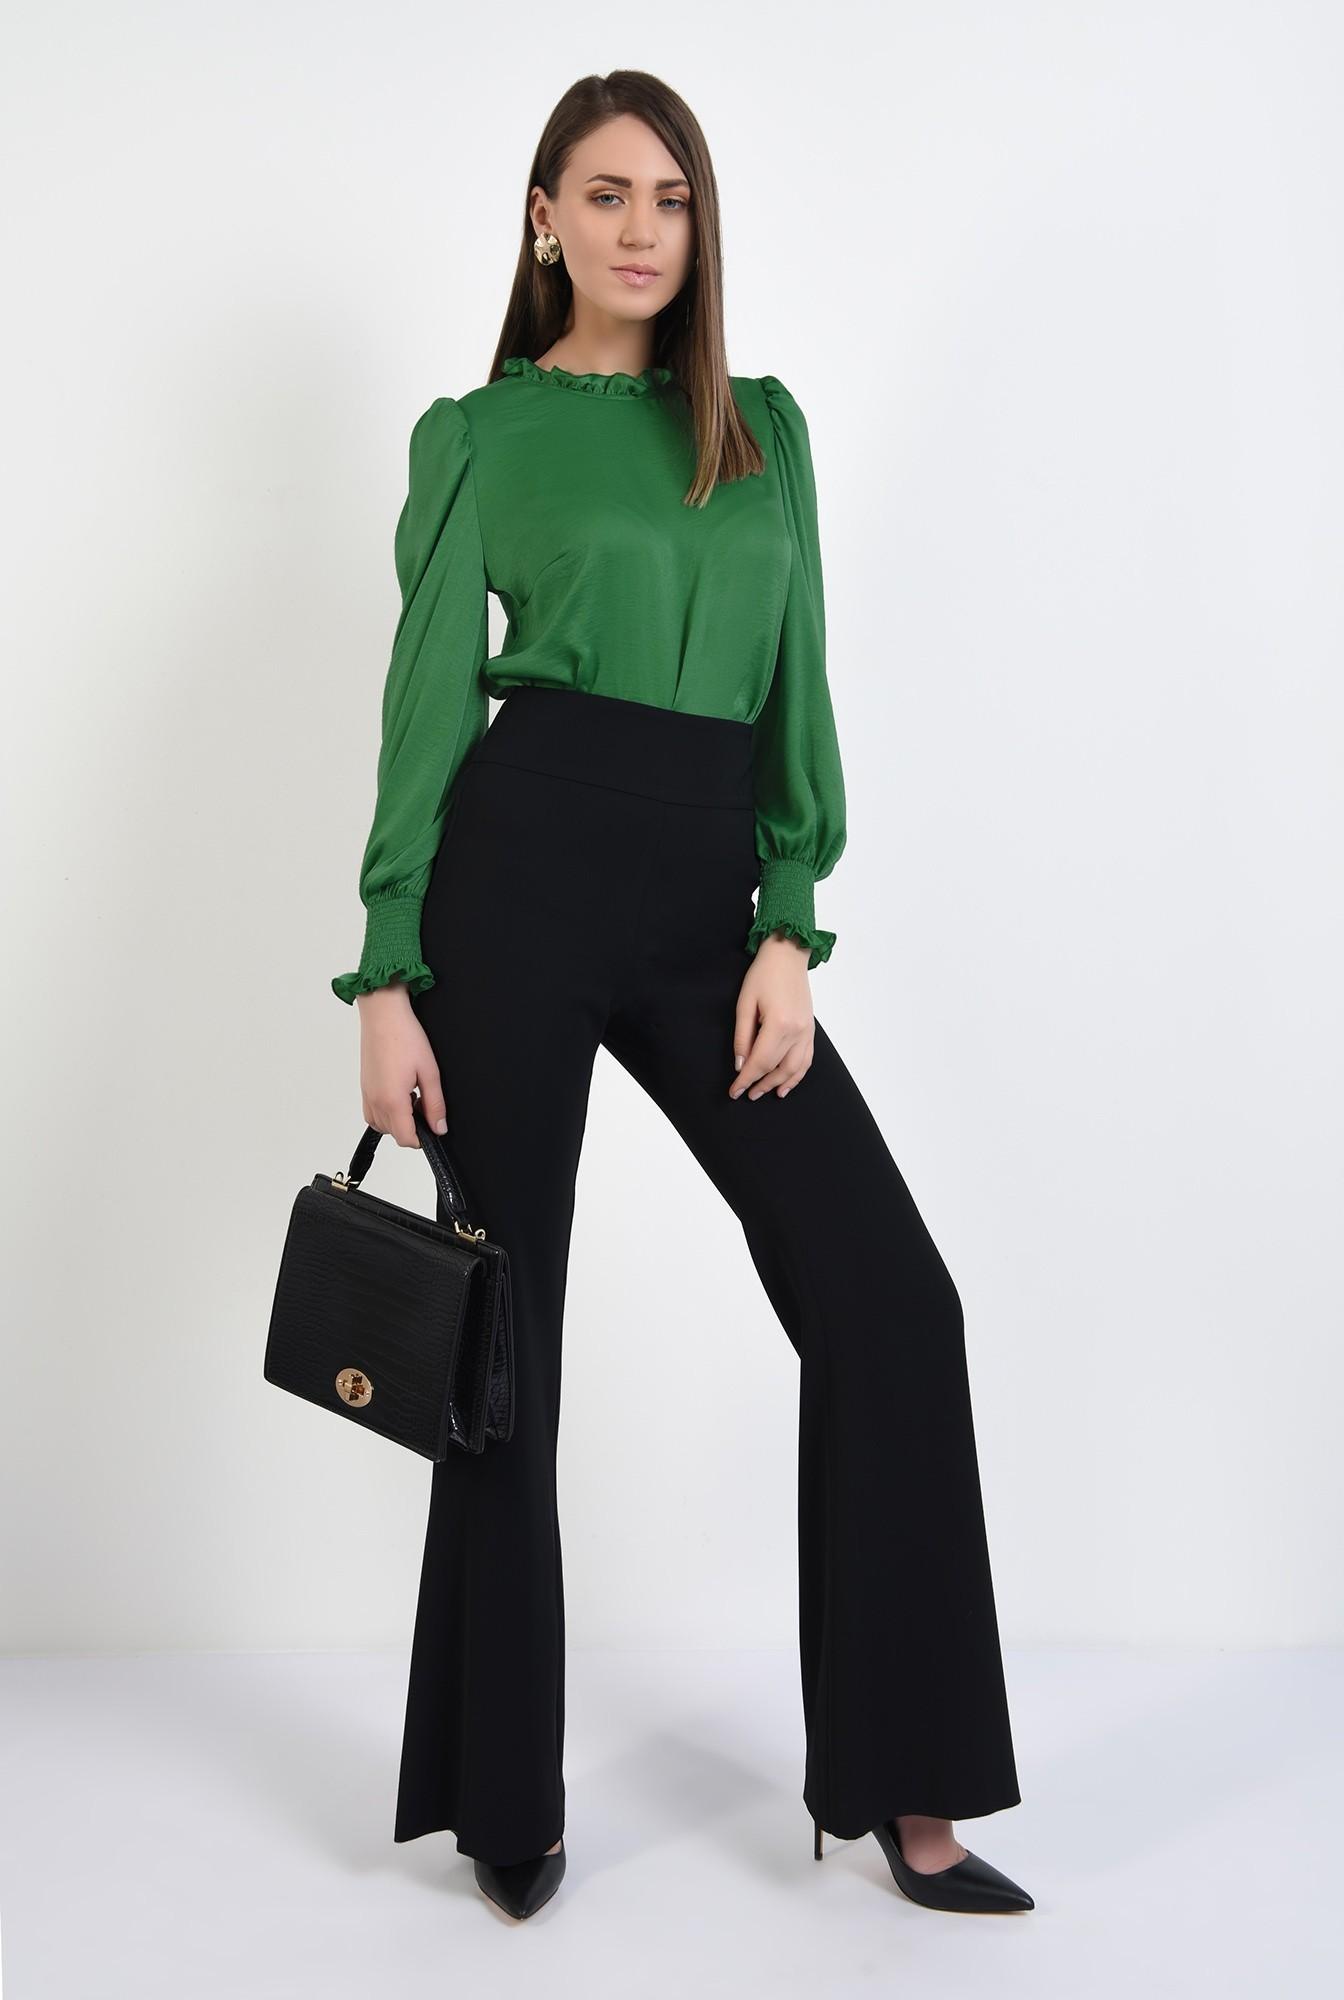 3 - bluza verde, din satin, guler incretit, maneci lungi, butoniera